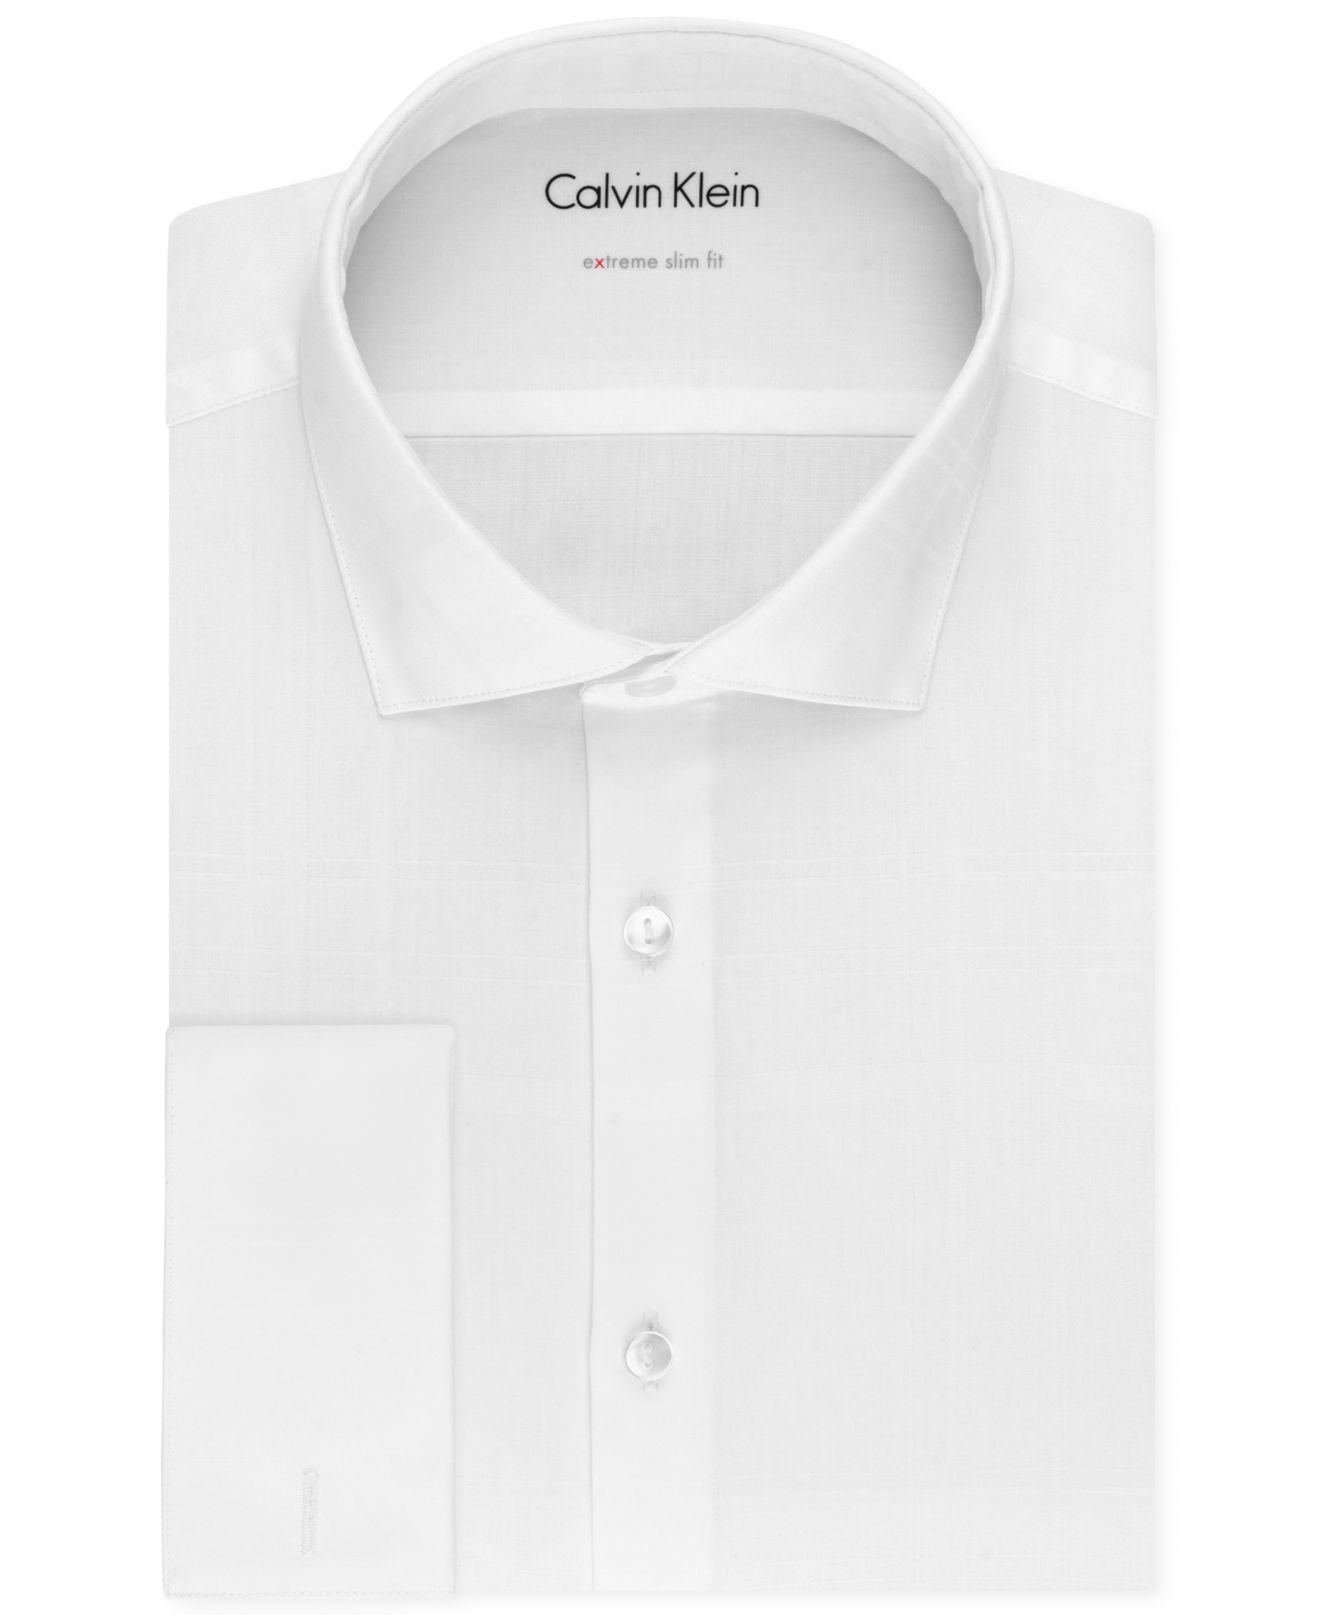 Calvin klein x men 39 s extra slim fit french cuff tuxedo for Extra slim tuxedo shirt